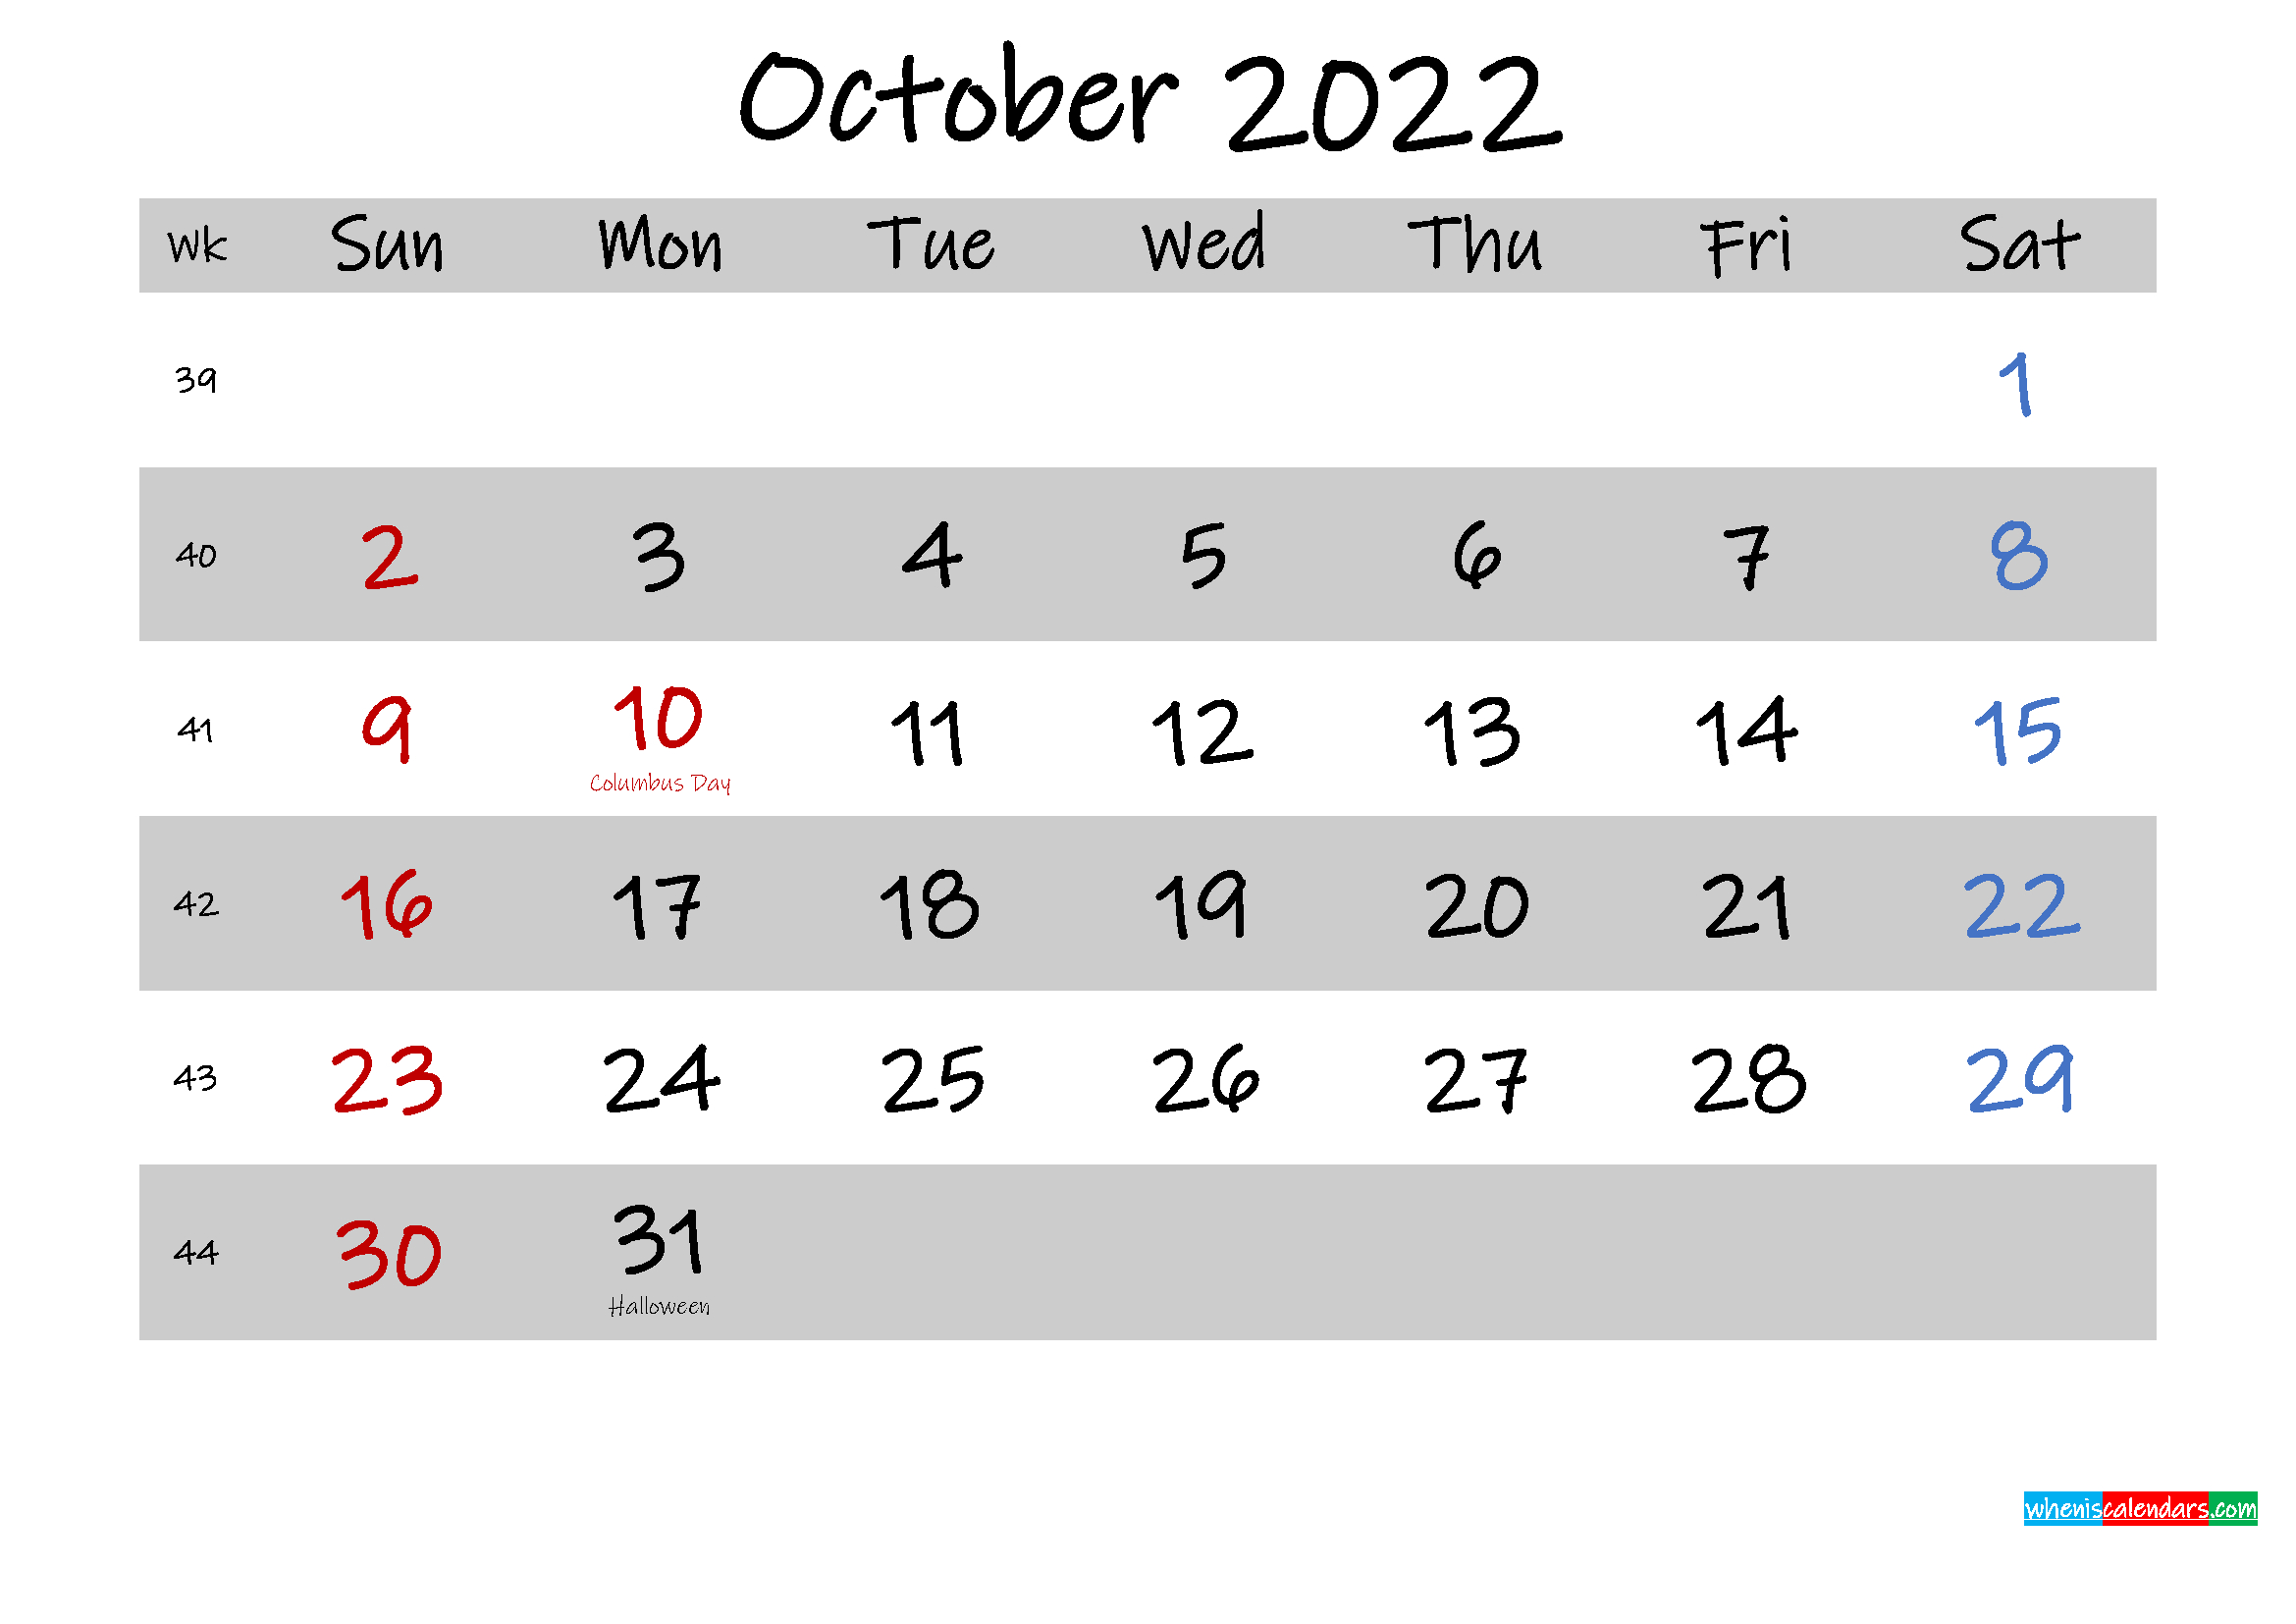 Free Printable October 2022 Calendar - Template No inside October 2022 Planner Calendar